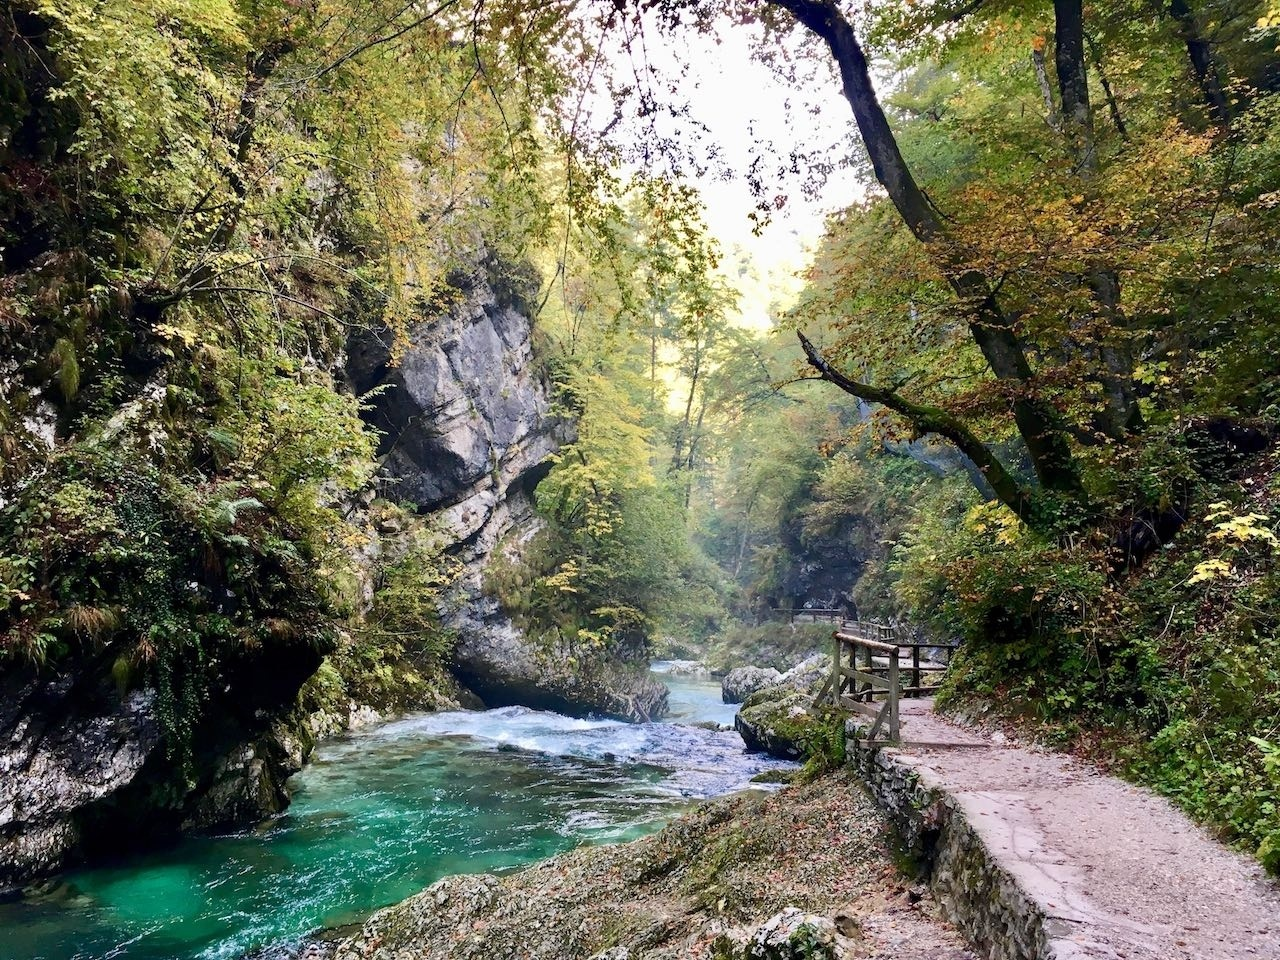 Lake Bled river, Slovakia.